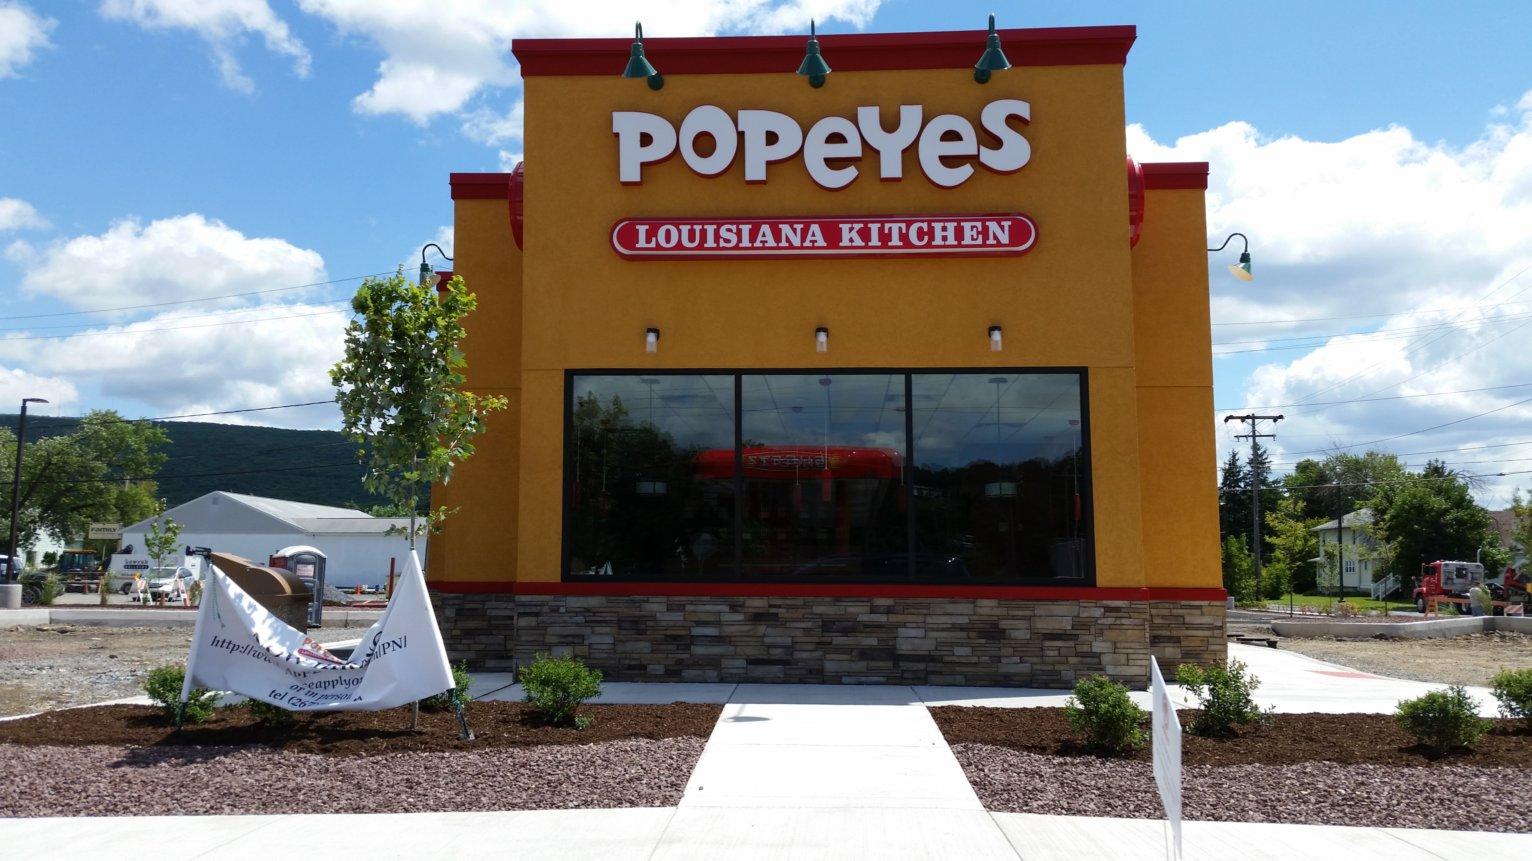 Popeyes Altoona, Pa